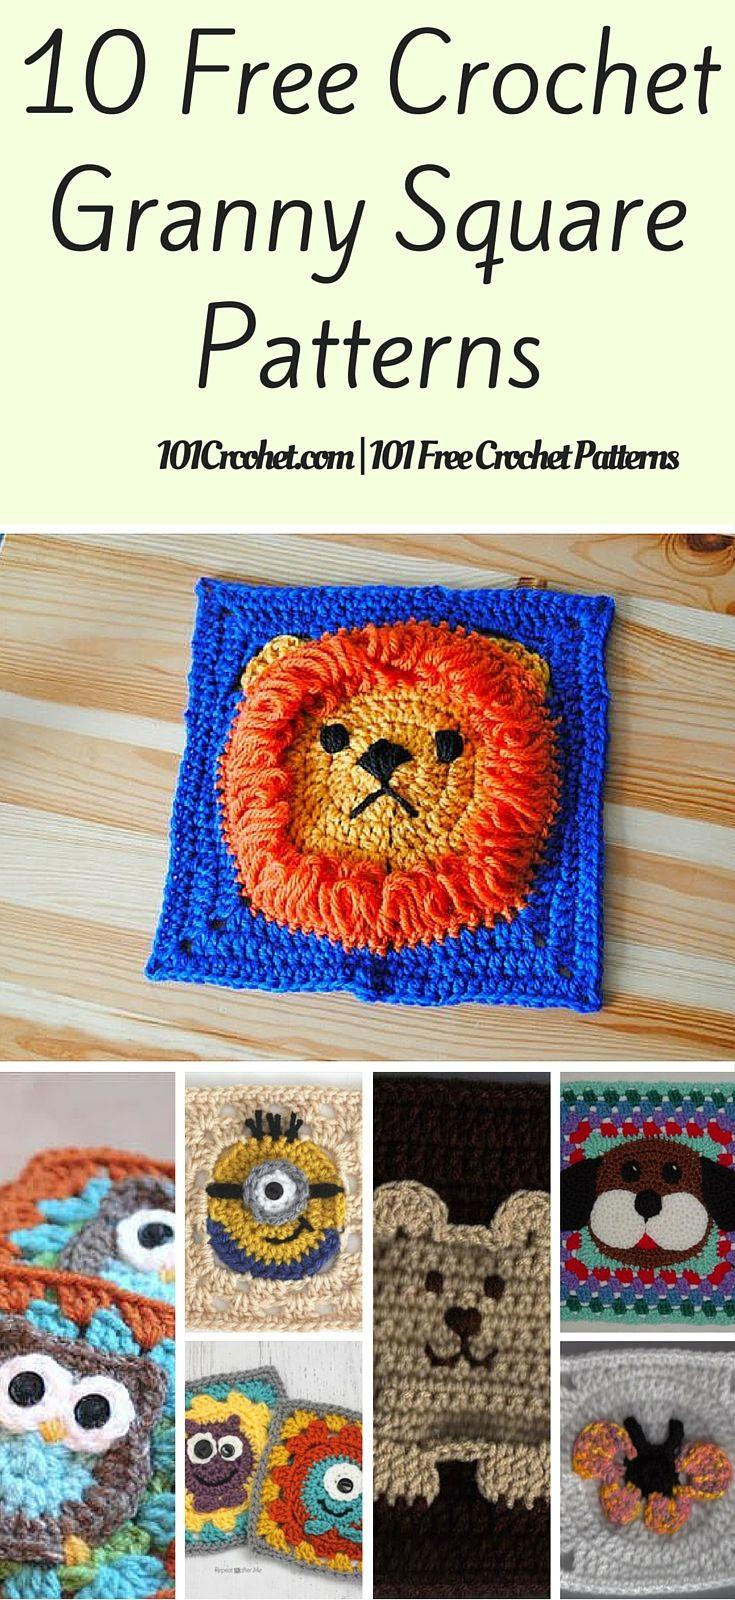 10 Free Crochet Granny Square Patterns | Häkelmuster, Häkeln und Decken